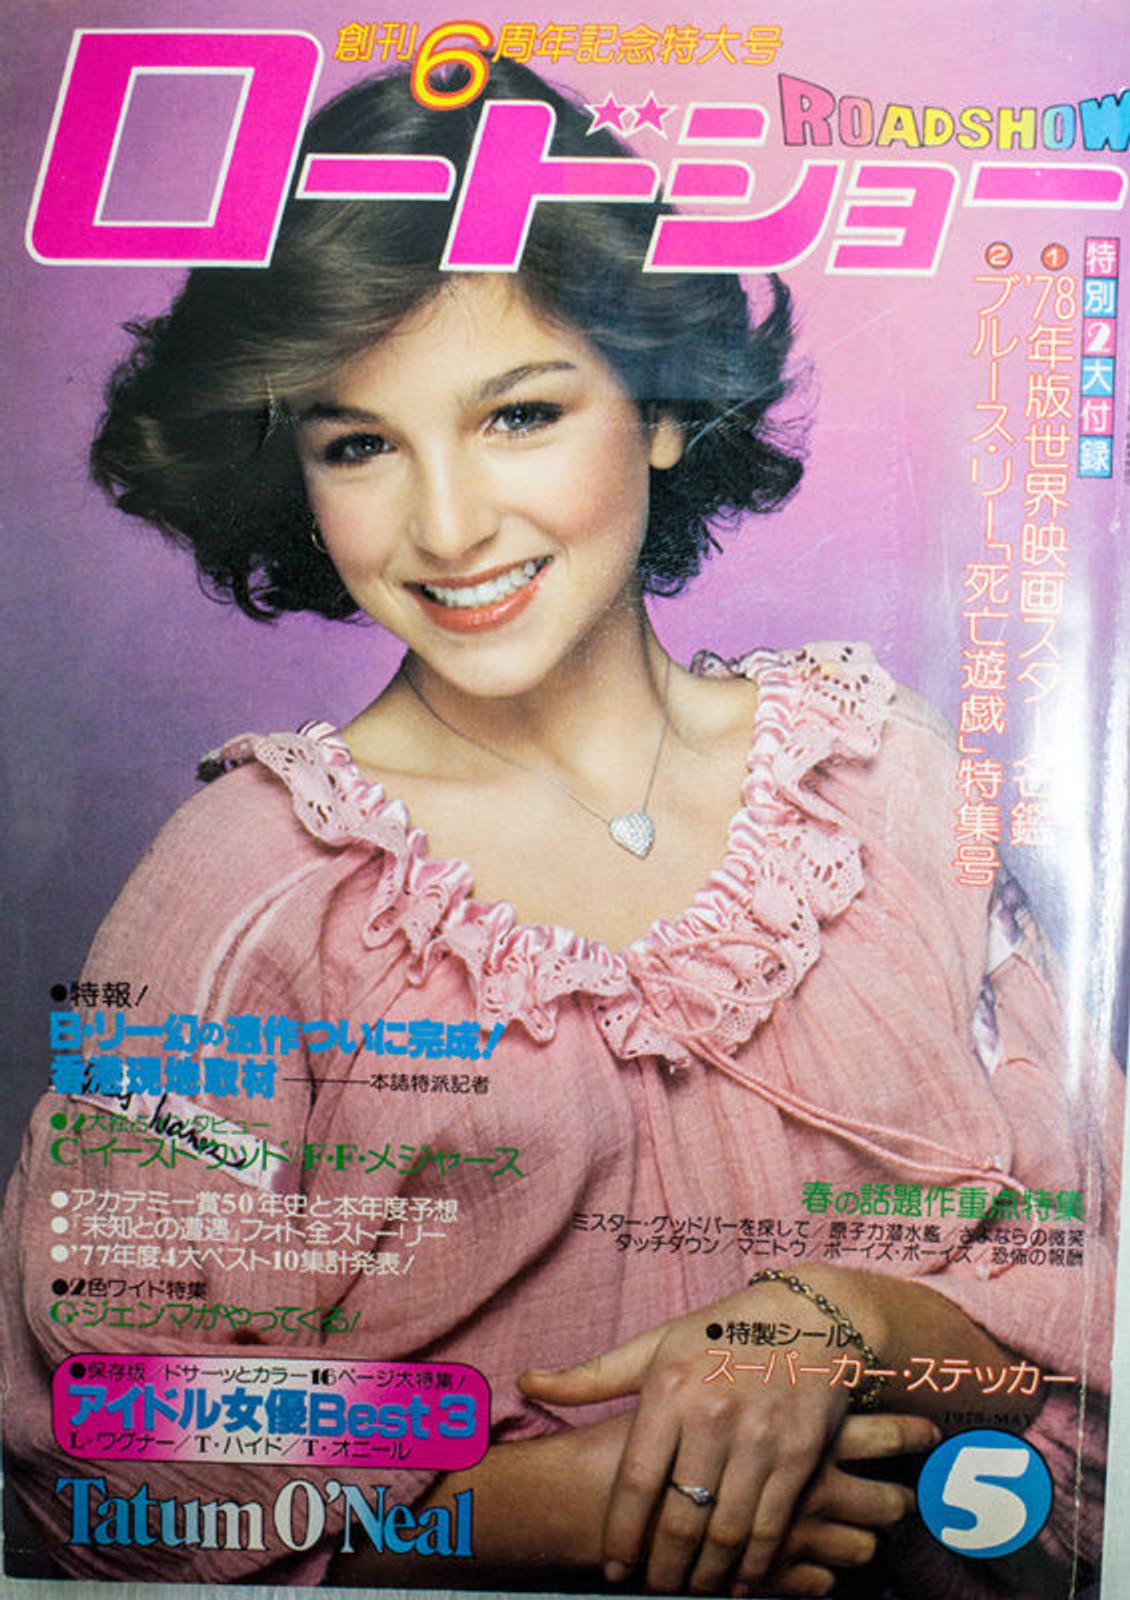 ROADSHOW 05/1978 Japan Movie Magazine TATUM O'NEAL/TRACY HYDE/JODIE FOSTER